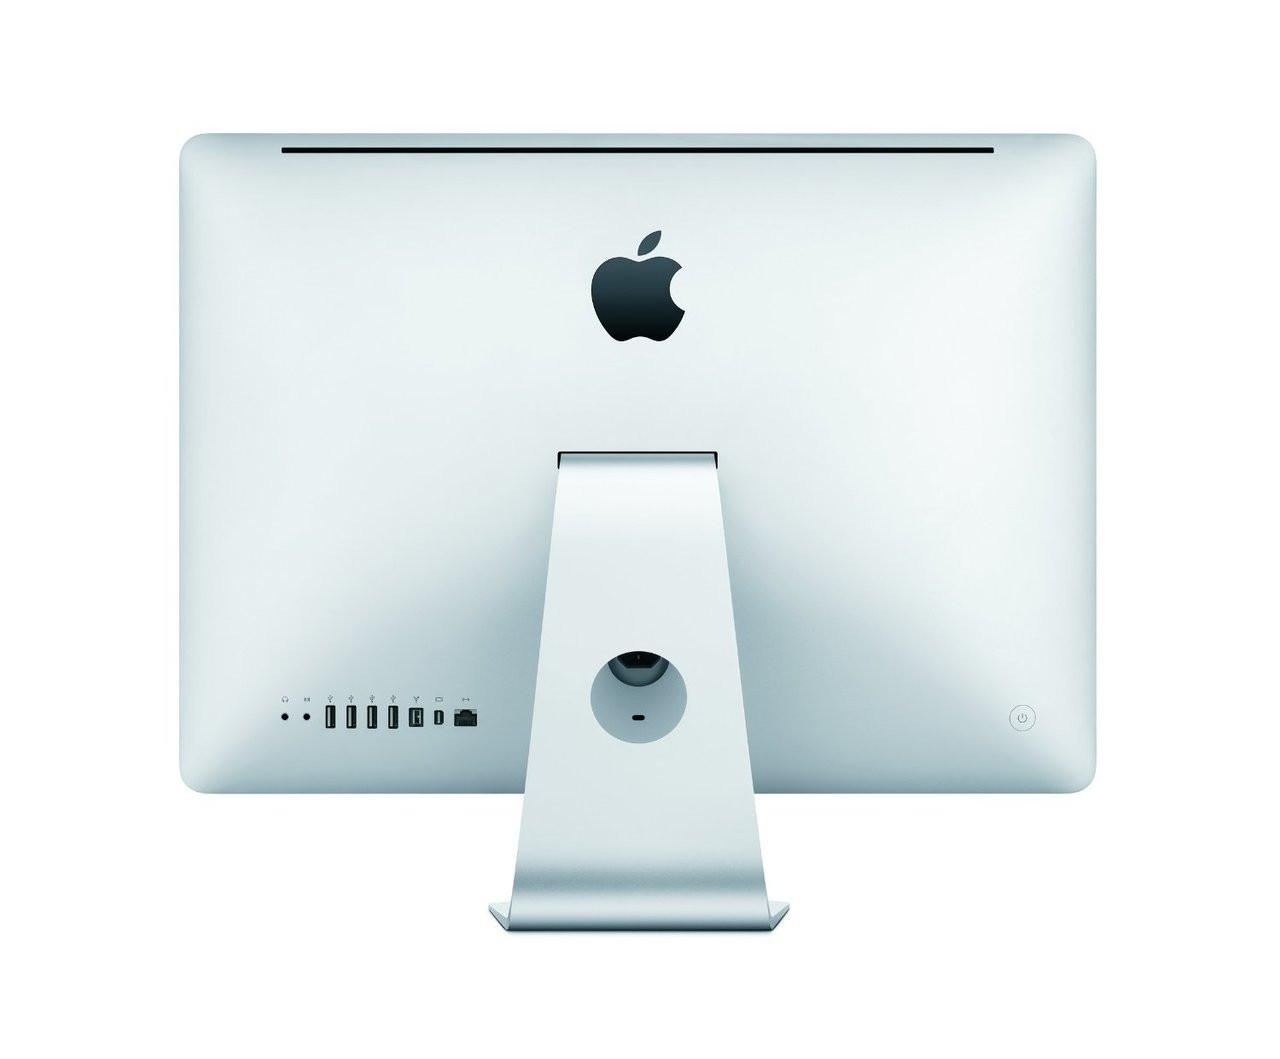 Apple-iMac-Core i3-21.5-Inch-A1311-back view